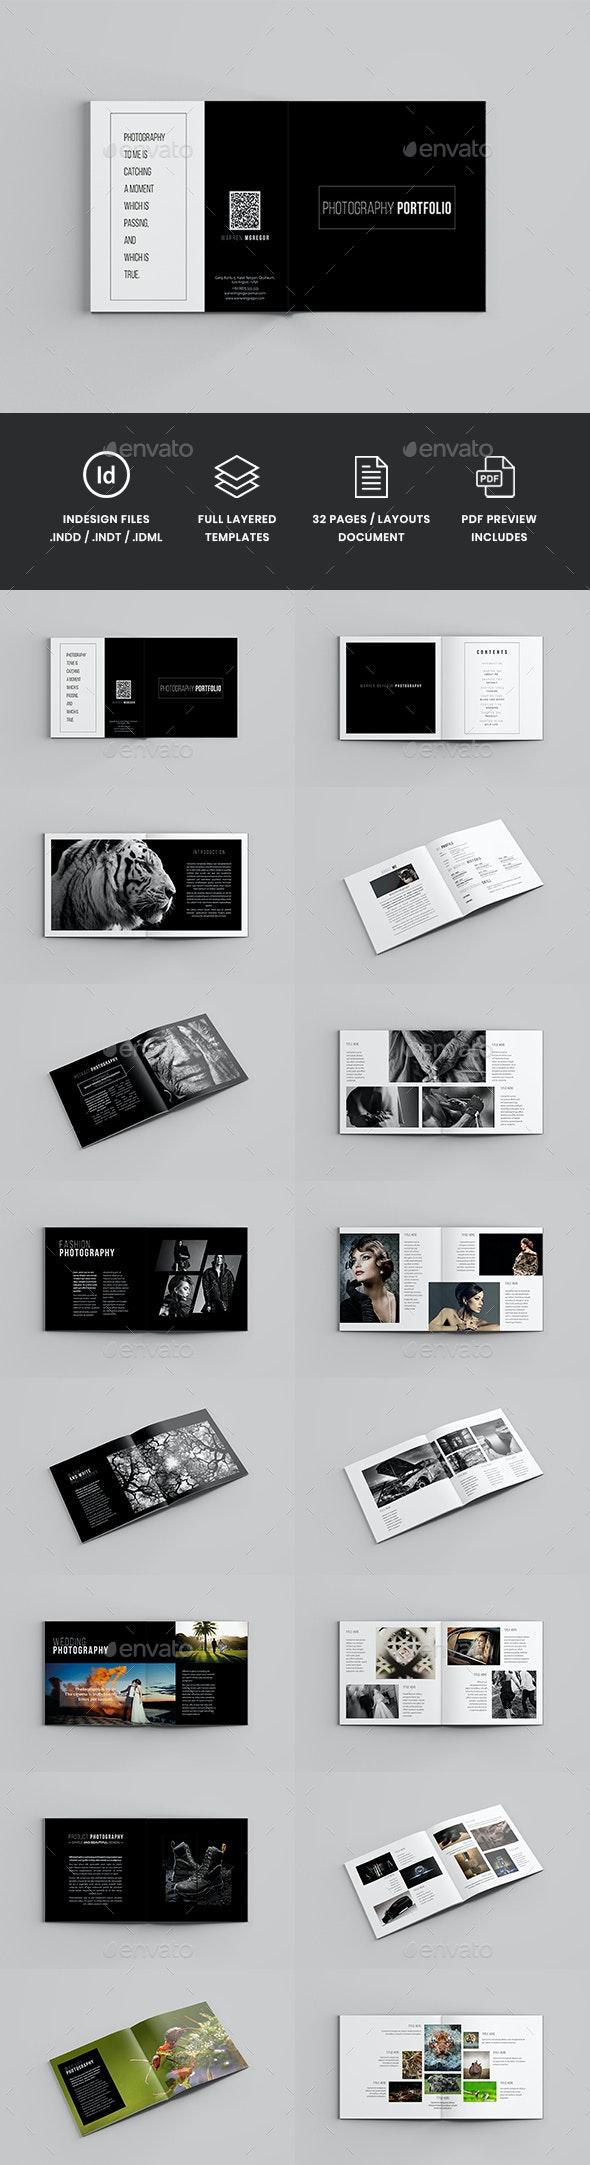 Gravix - Square Photography Brochure Template - Portfolio Brochures